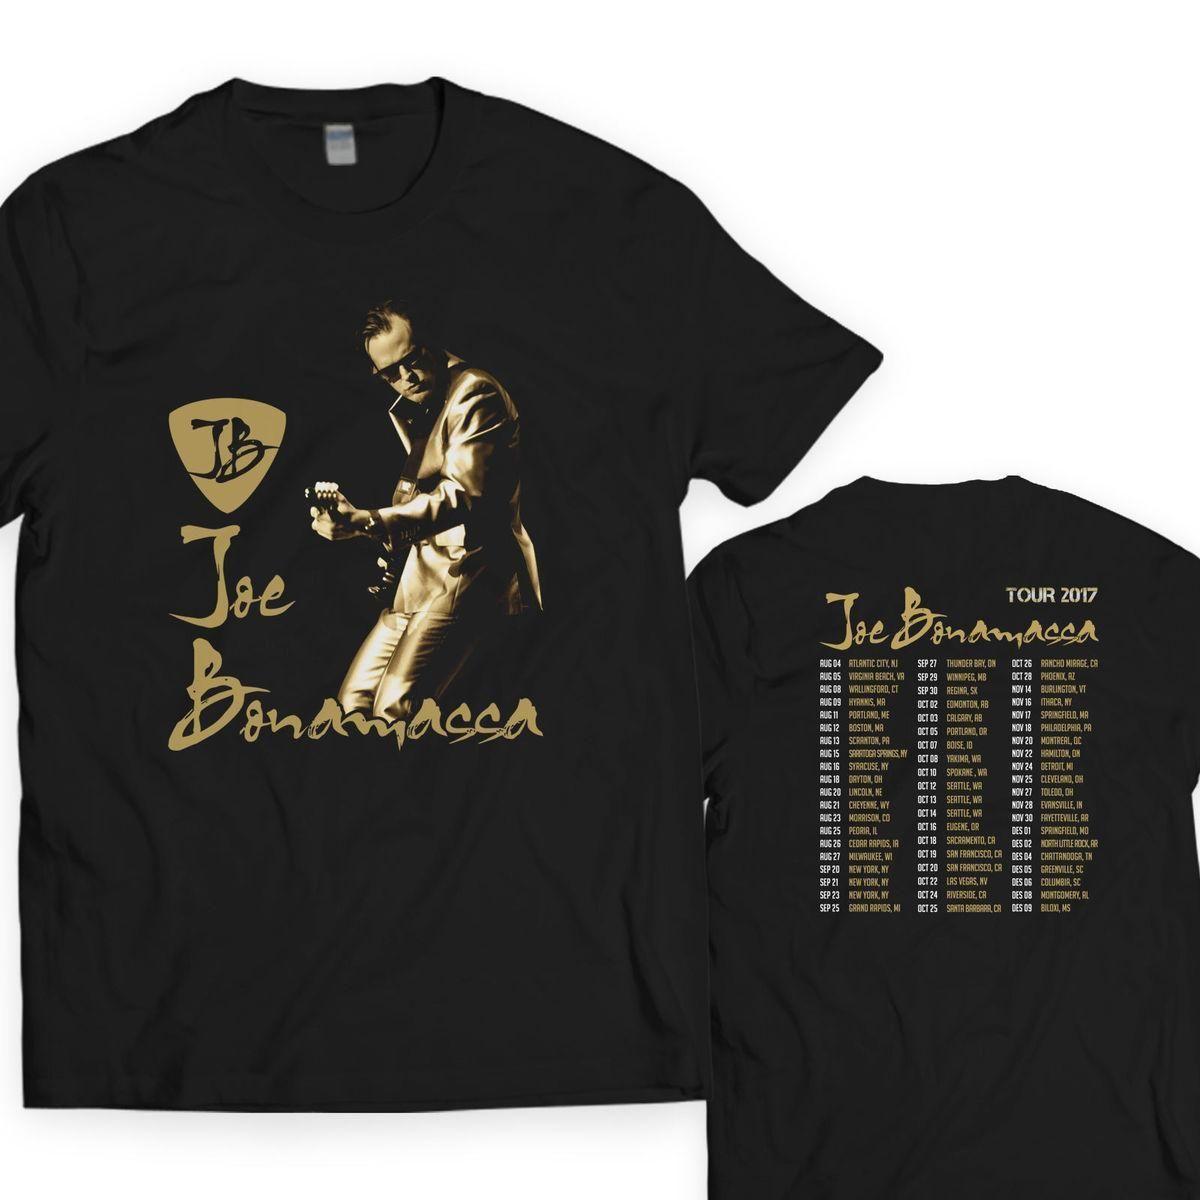 829f6220 JOE BONAMASSA GUITARIST Tour Dates 2017 S-3XL Men's Unisex T Shirt Short  Sleeves Cotton Fashion Free Shipping T-shirt